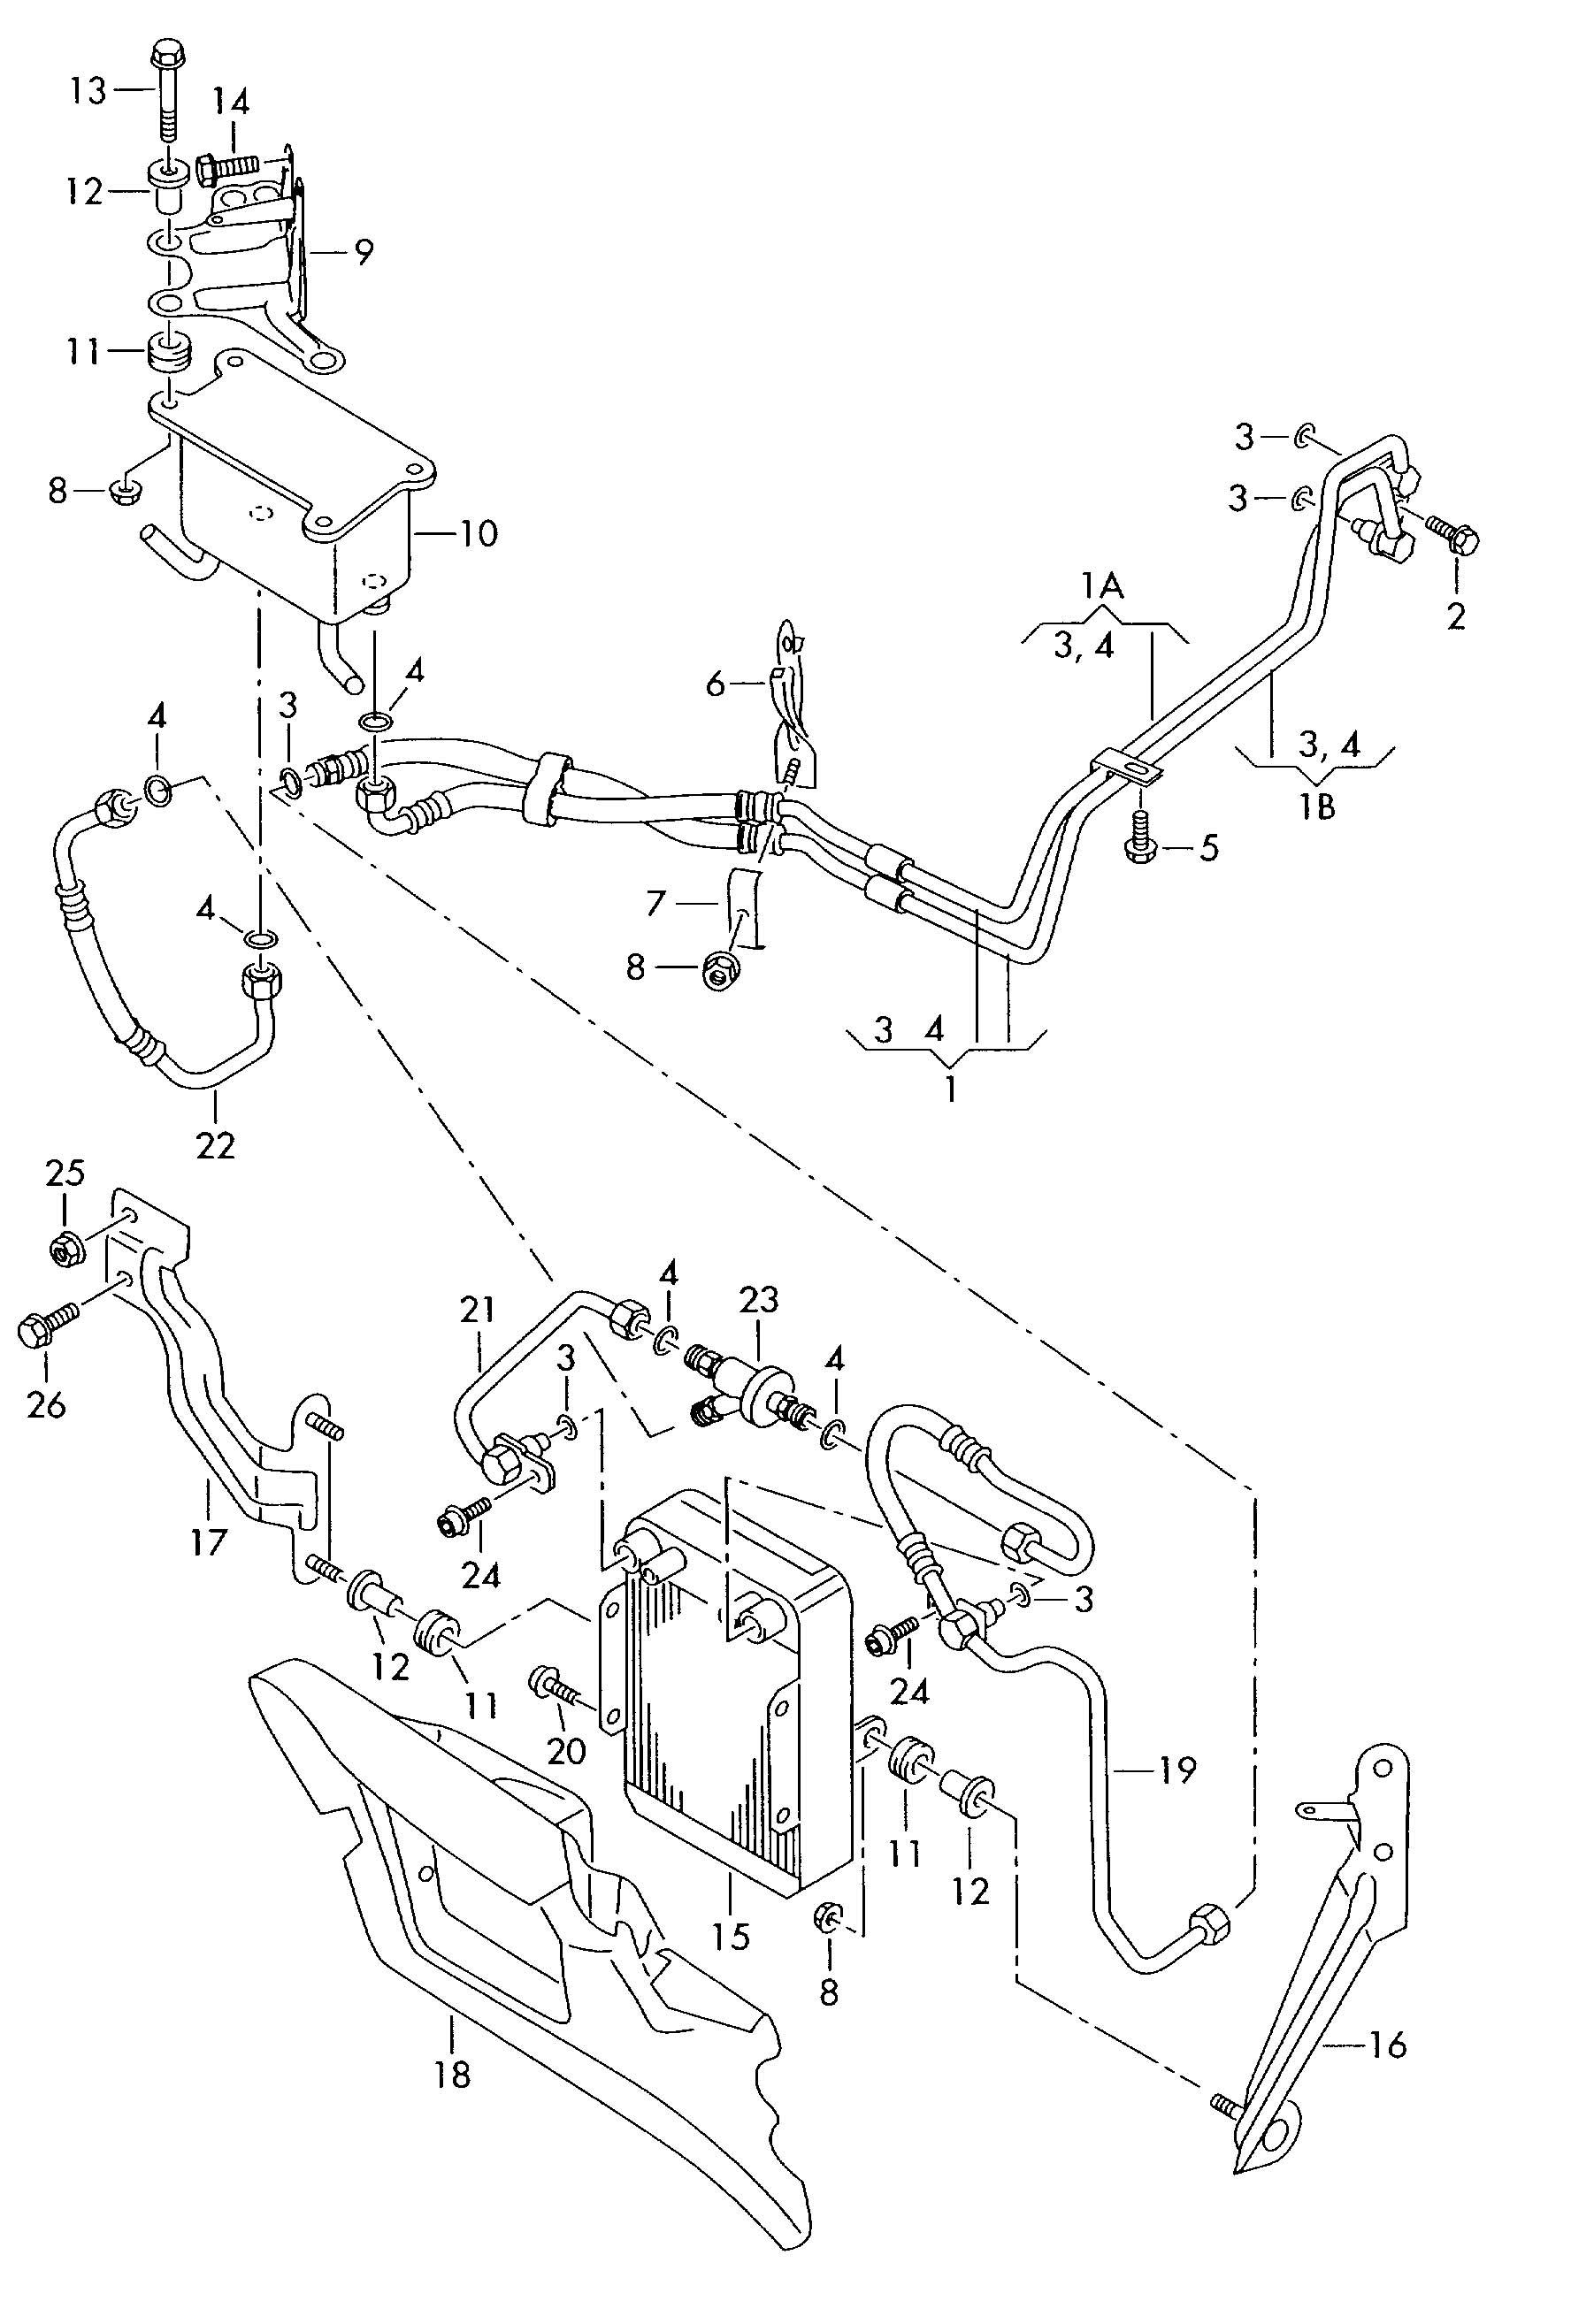 wiring diagram furthermore brake light wiring diagram for 1998 ford